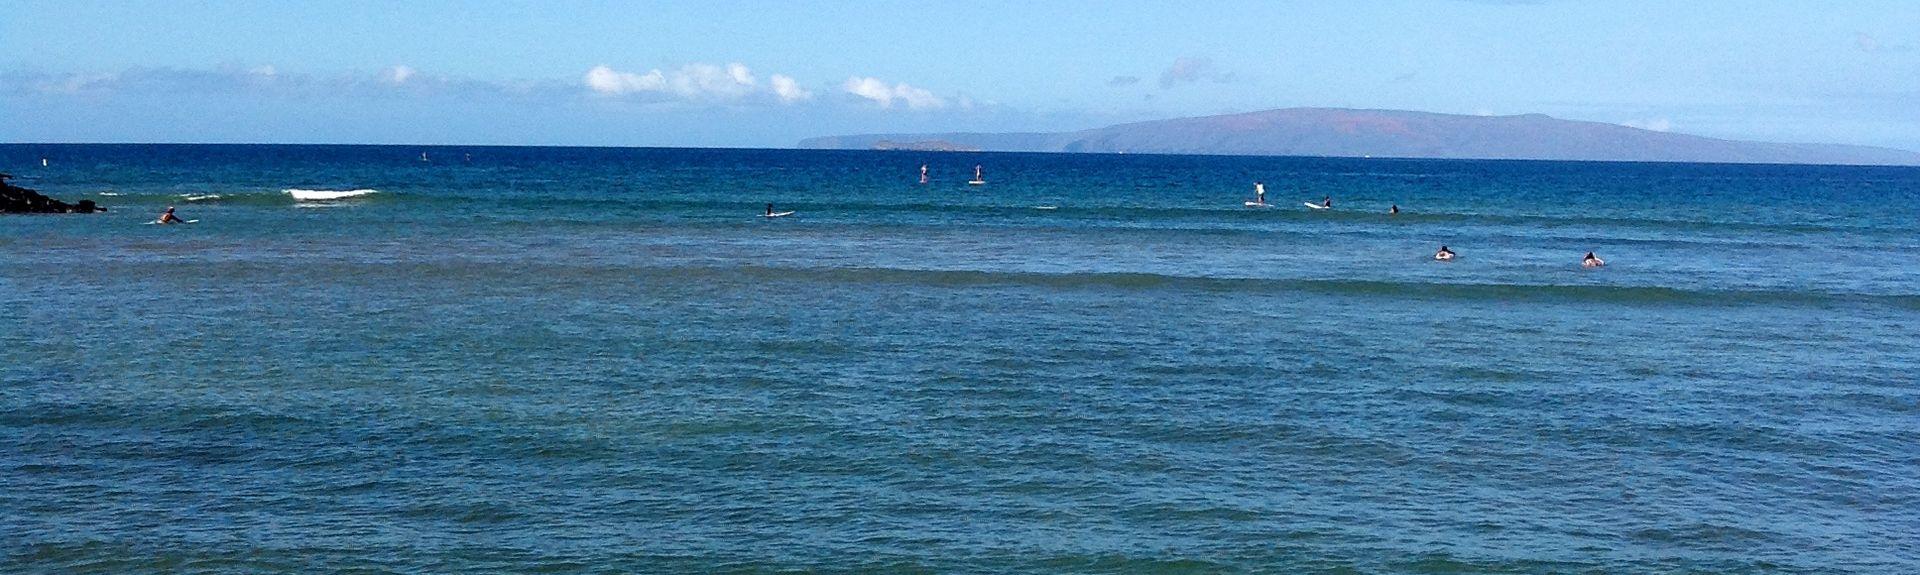 Pacific Shores (Kihei, Havaiji, Yhdysvallat)